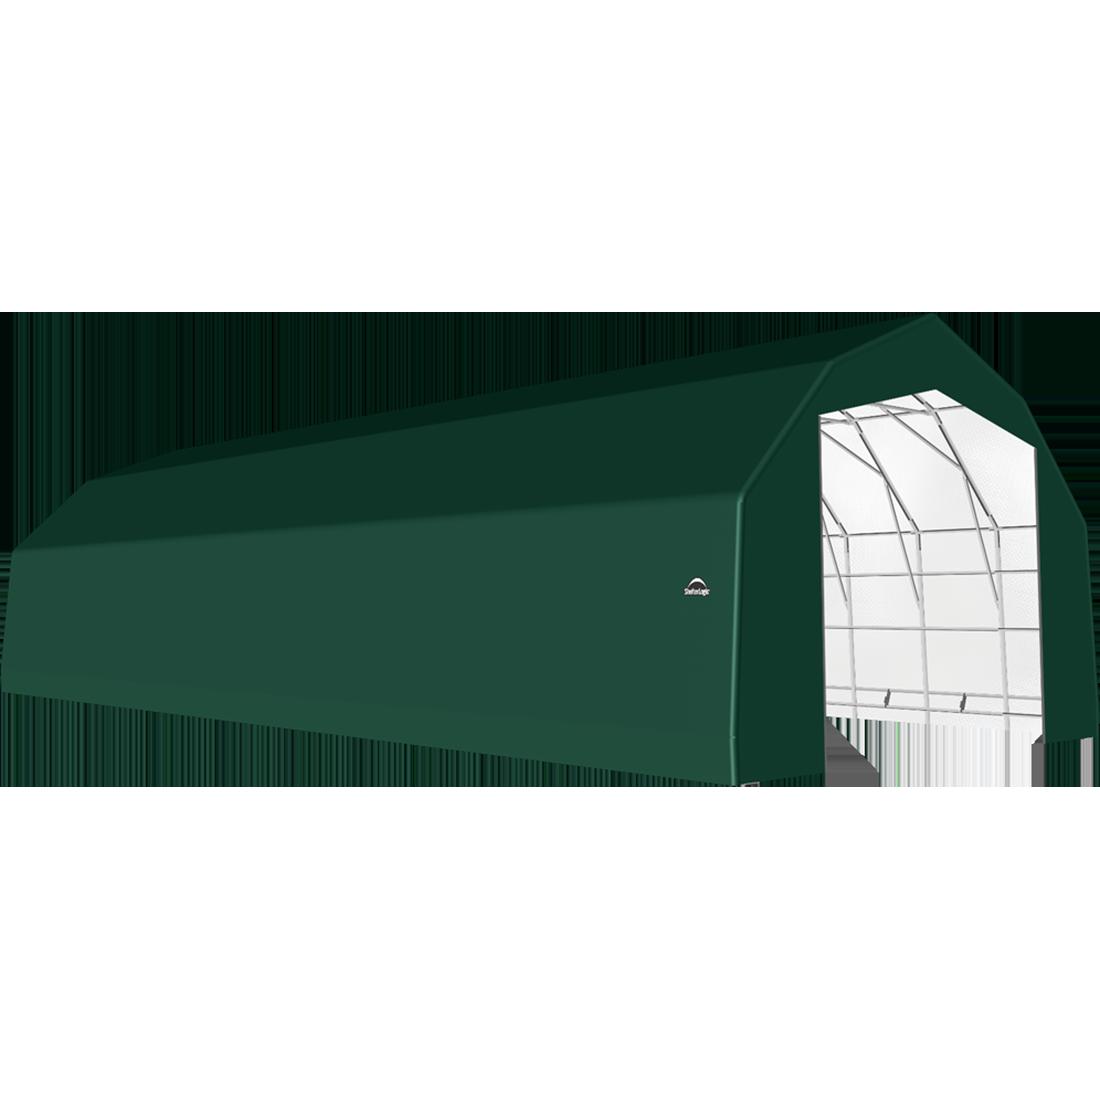 ShelterTech SP Series Barn Shelter, 25 ft. x 56 ft. x 17 ft. Heavy Duty PVC 14.5 oz. Green